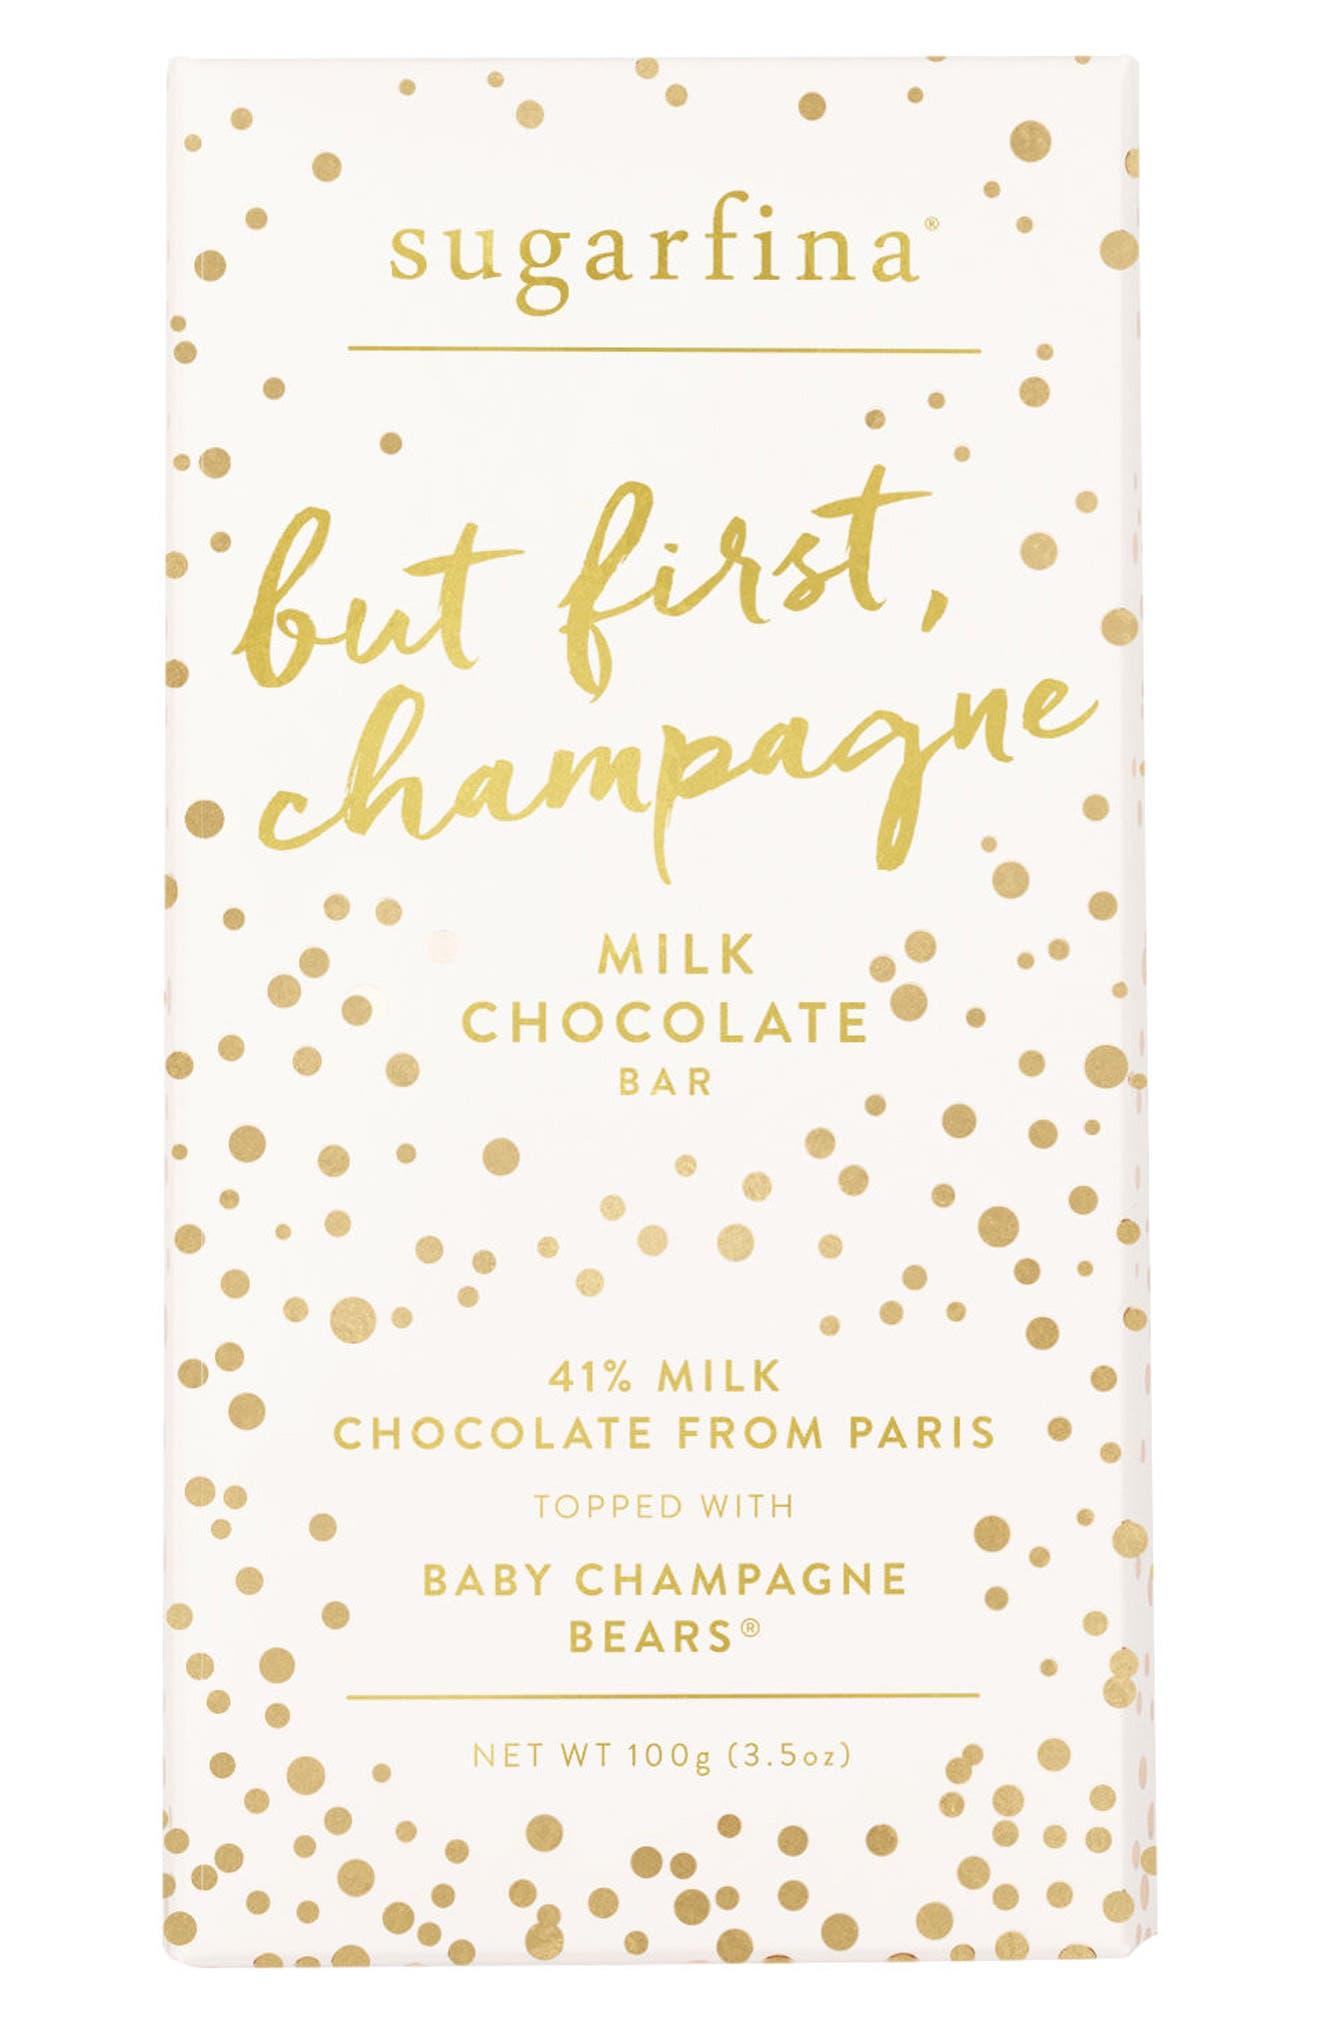 2-Pack Milk Chocolate Champagne Bears Bars,                             Main thumbnail 1, color,                             650